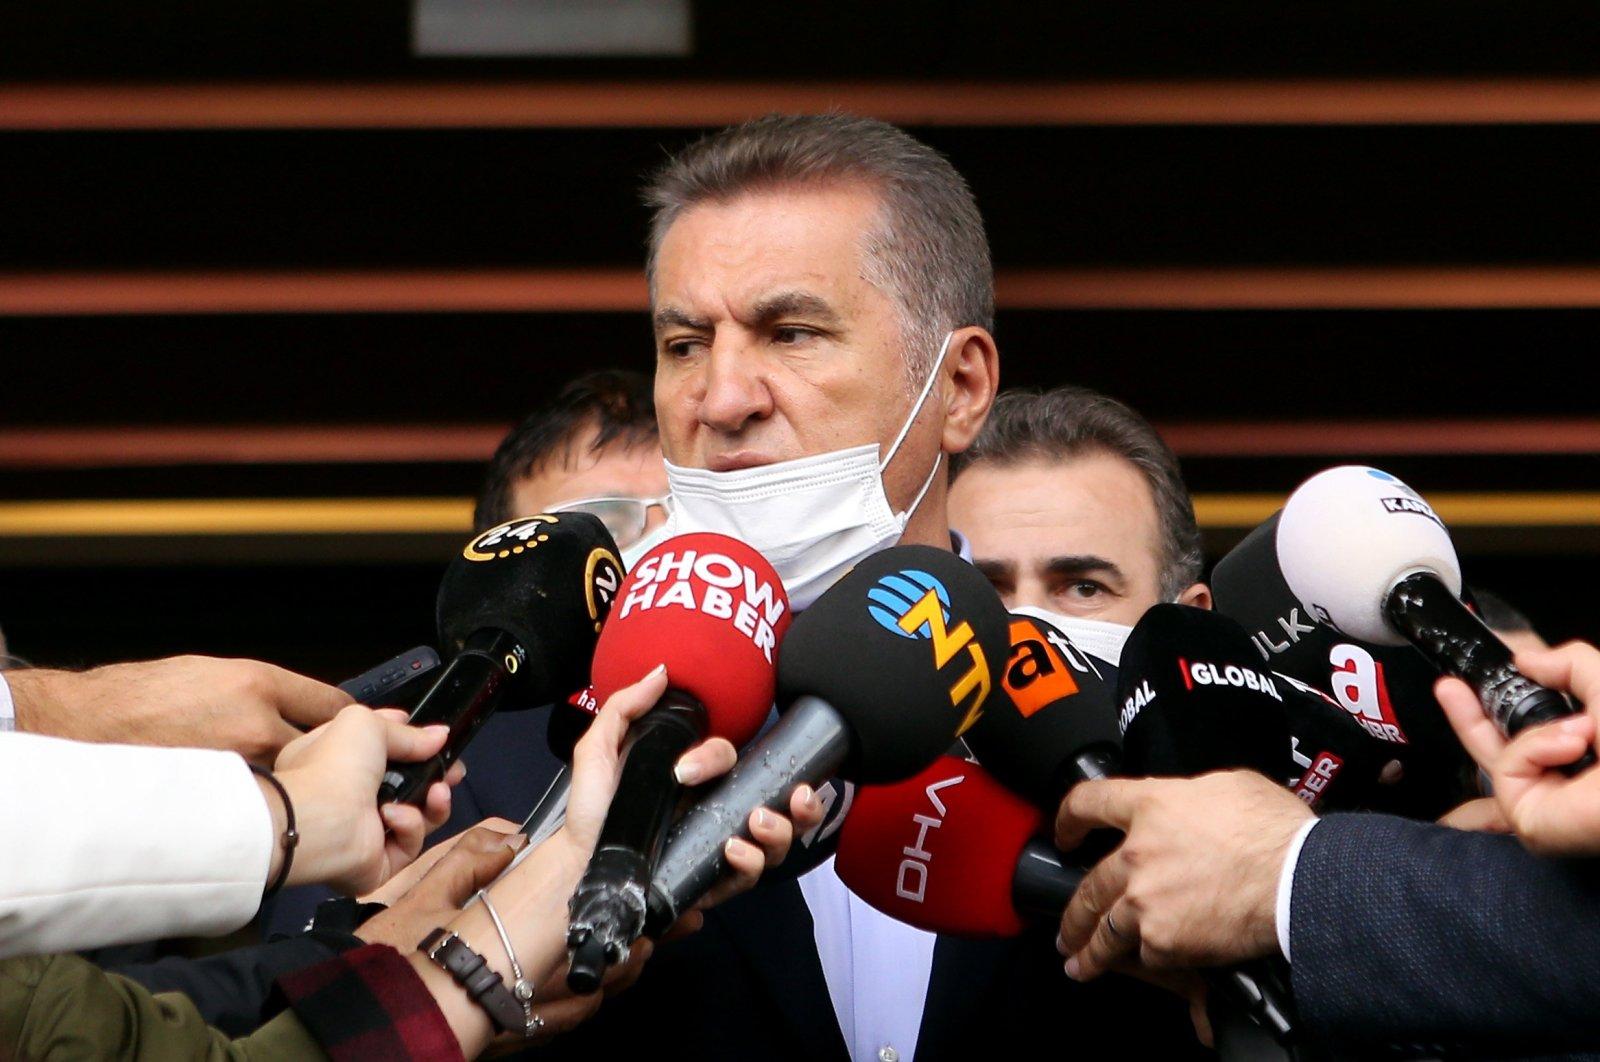 Former Şişli district Mayor Mustafa Sarıgül speaks to reporters at a hospital in Istanbul after visiting the family of late Prime Minister Mesut Yılmaz, Nov. 6, 2020. (Sabah File Photo)